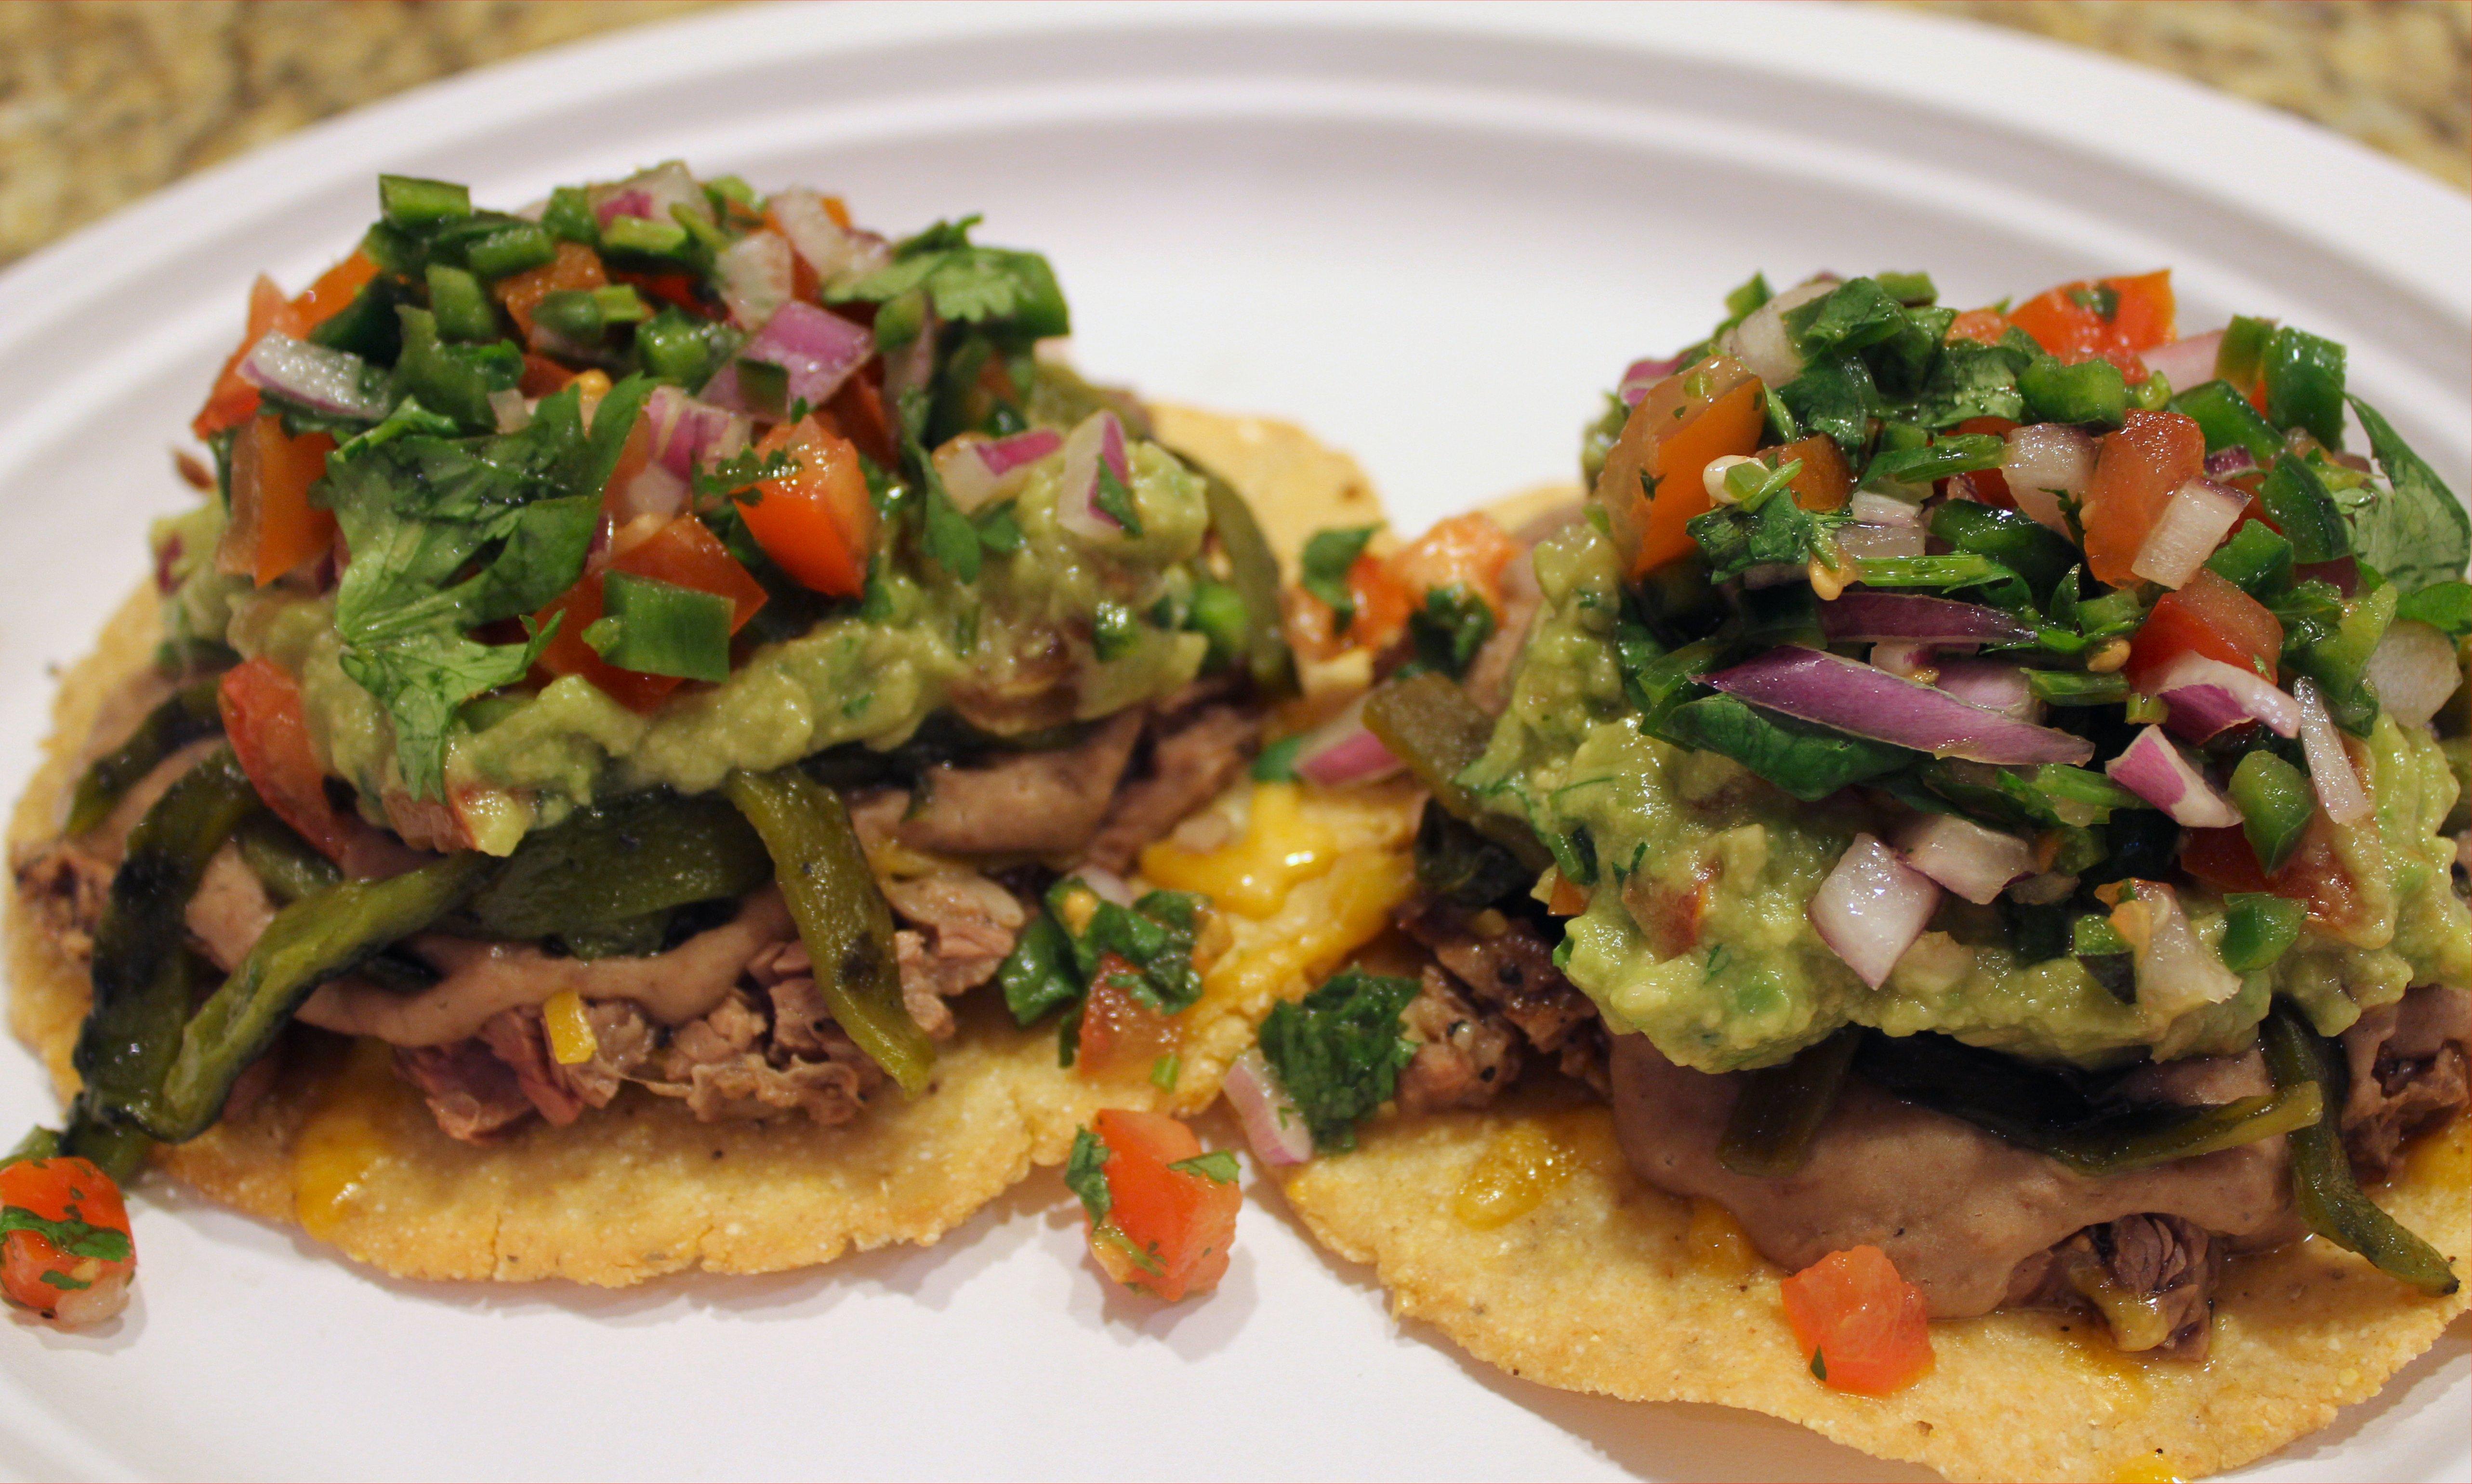 Fajita tostadas for Mexican food